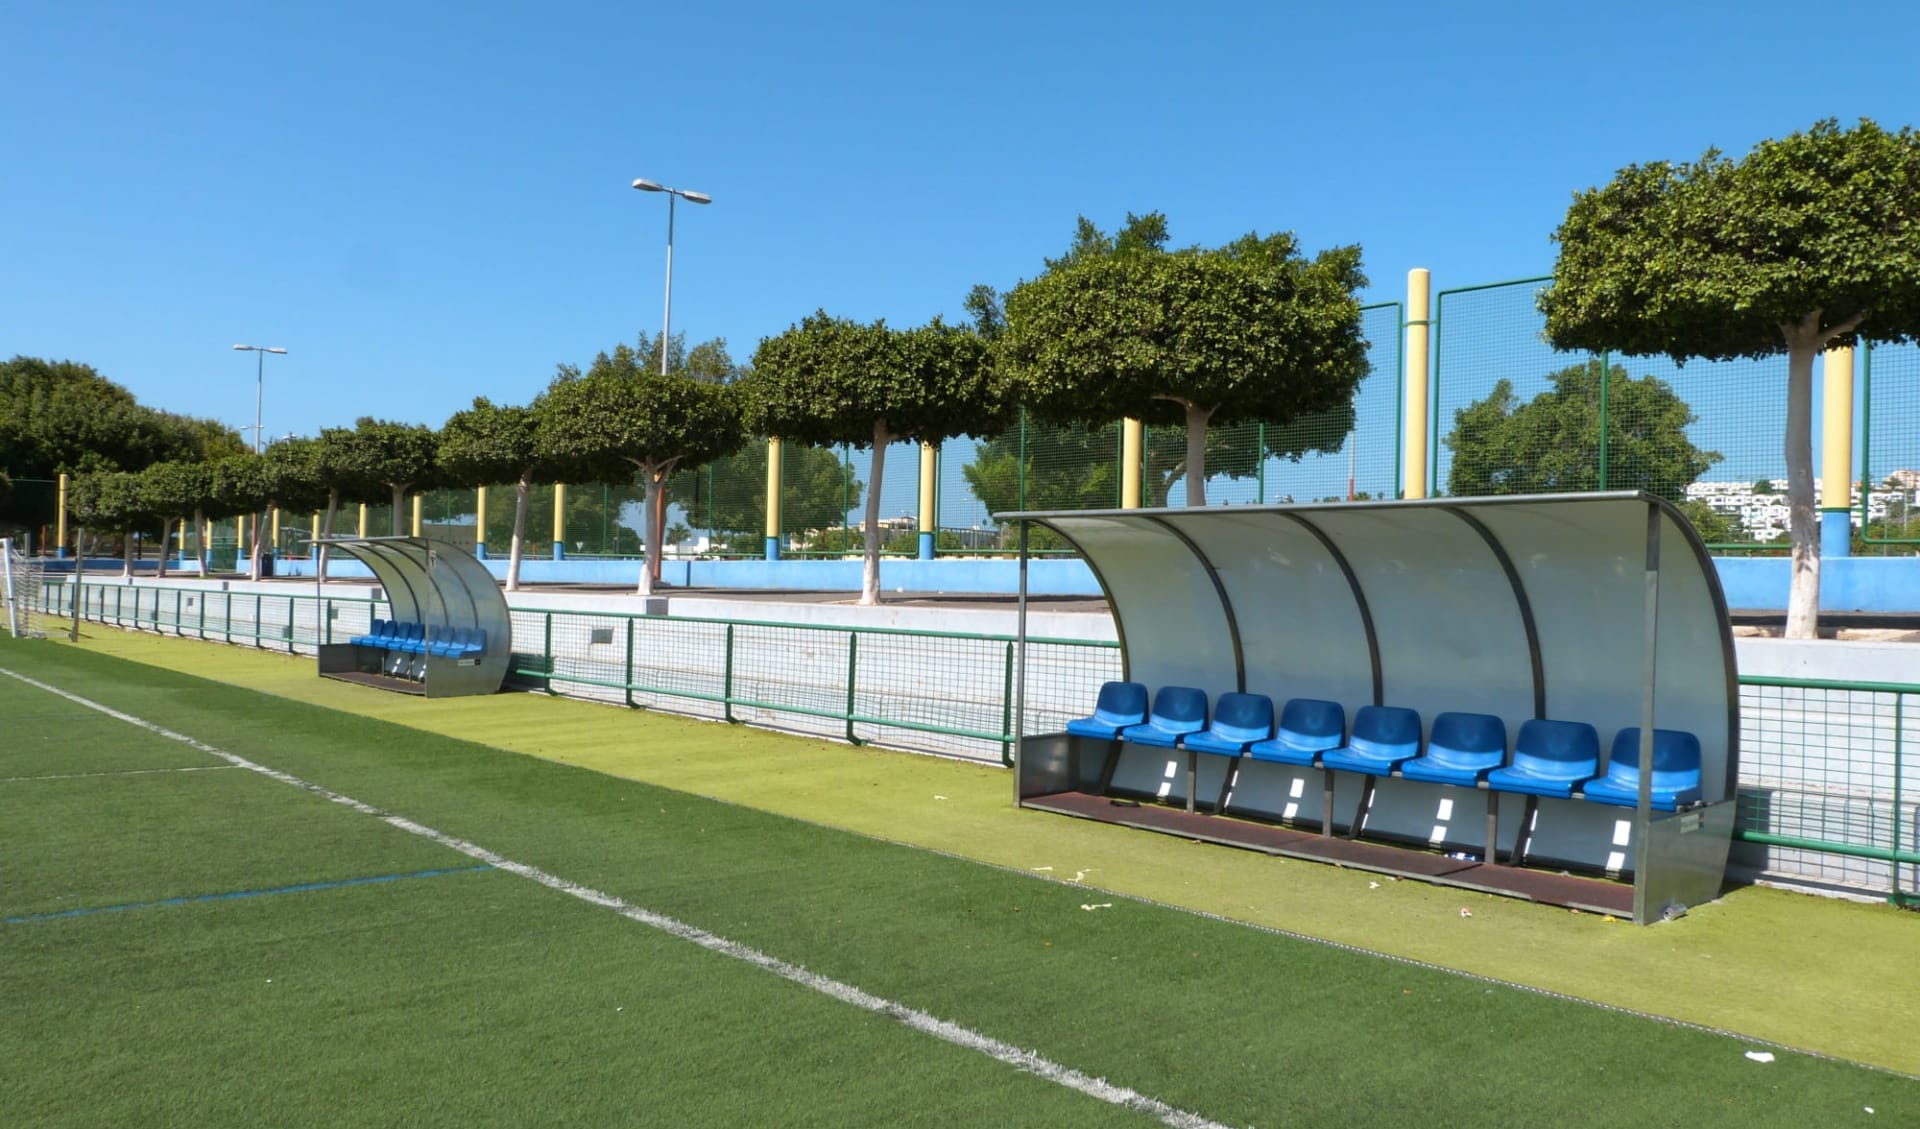 Maspalomas - Appartements Turbo Club ab Gran Canaria: A1_Spielerbank